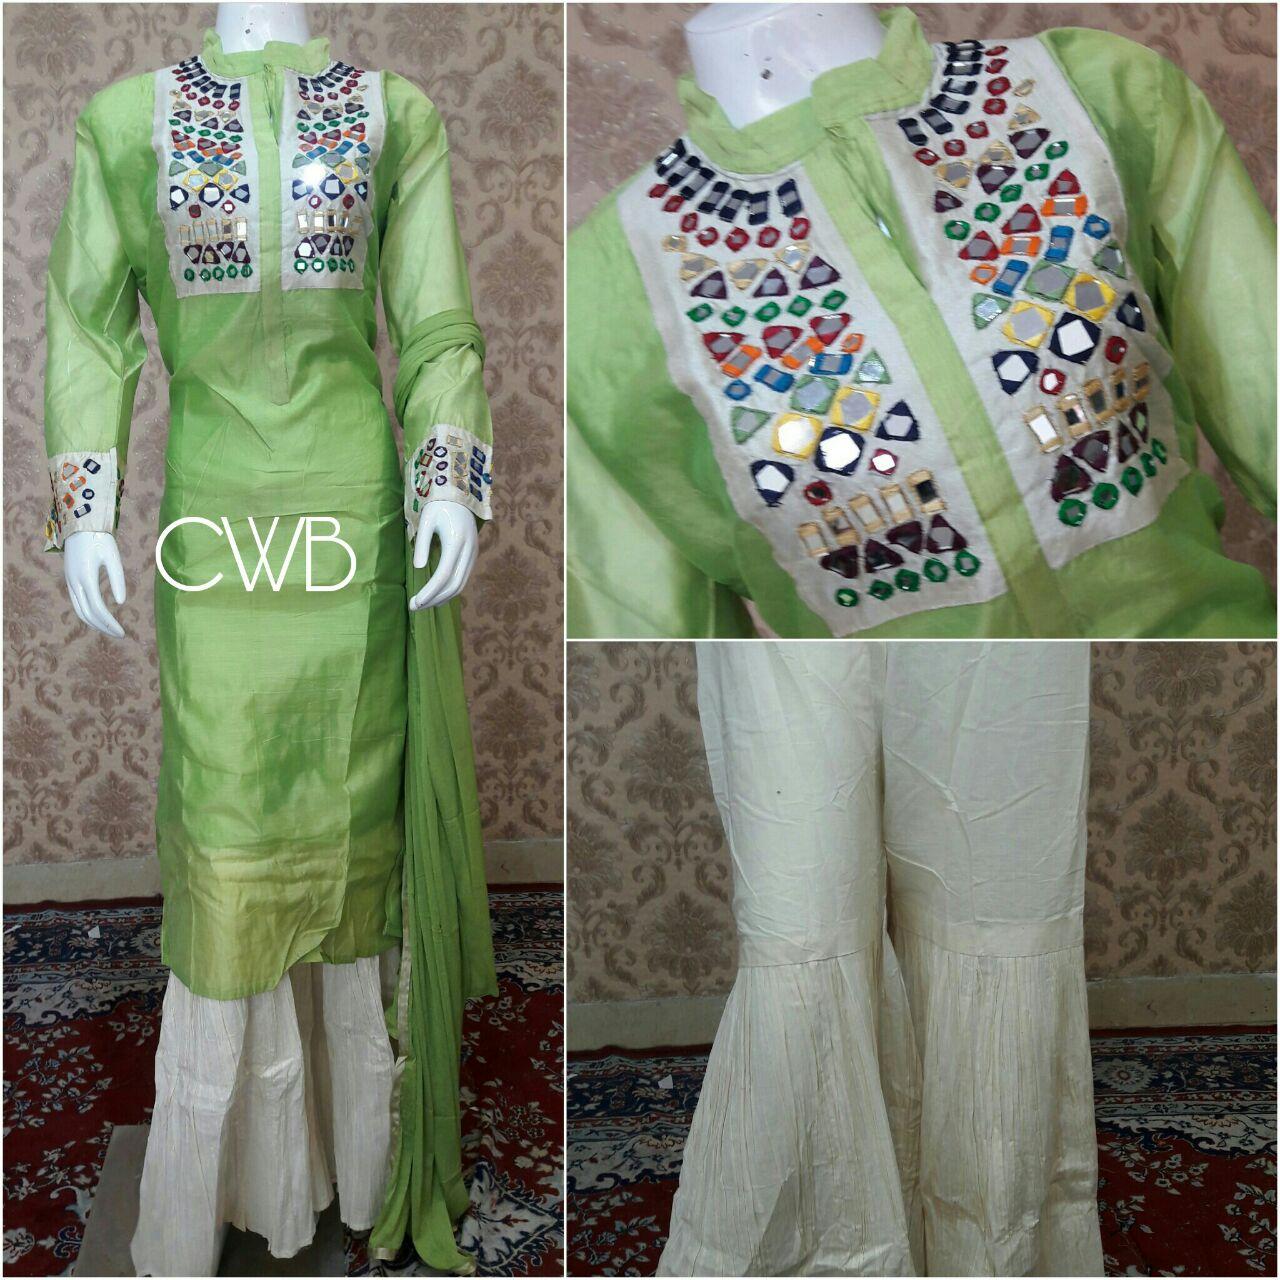 Shirt design with plazo - Shirt Chanderi Cotton Inner Attached Bust Size 44 Aprx Bottom Cotton Designer Plazo Stylish Waist 36 Aprx Dupata Chiffon Code Pm